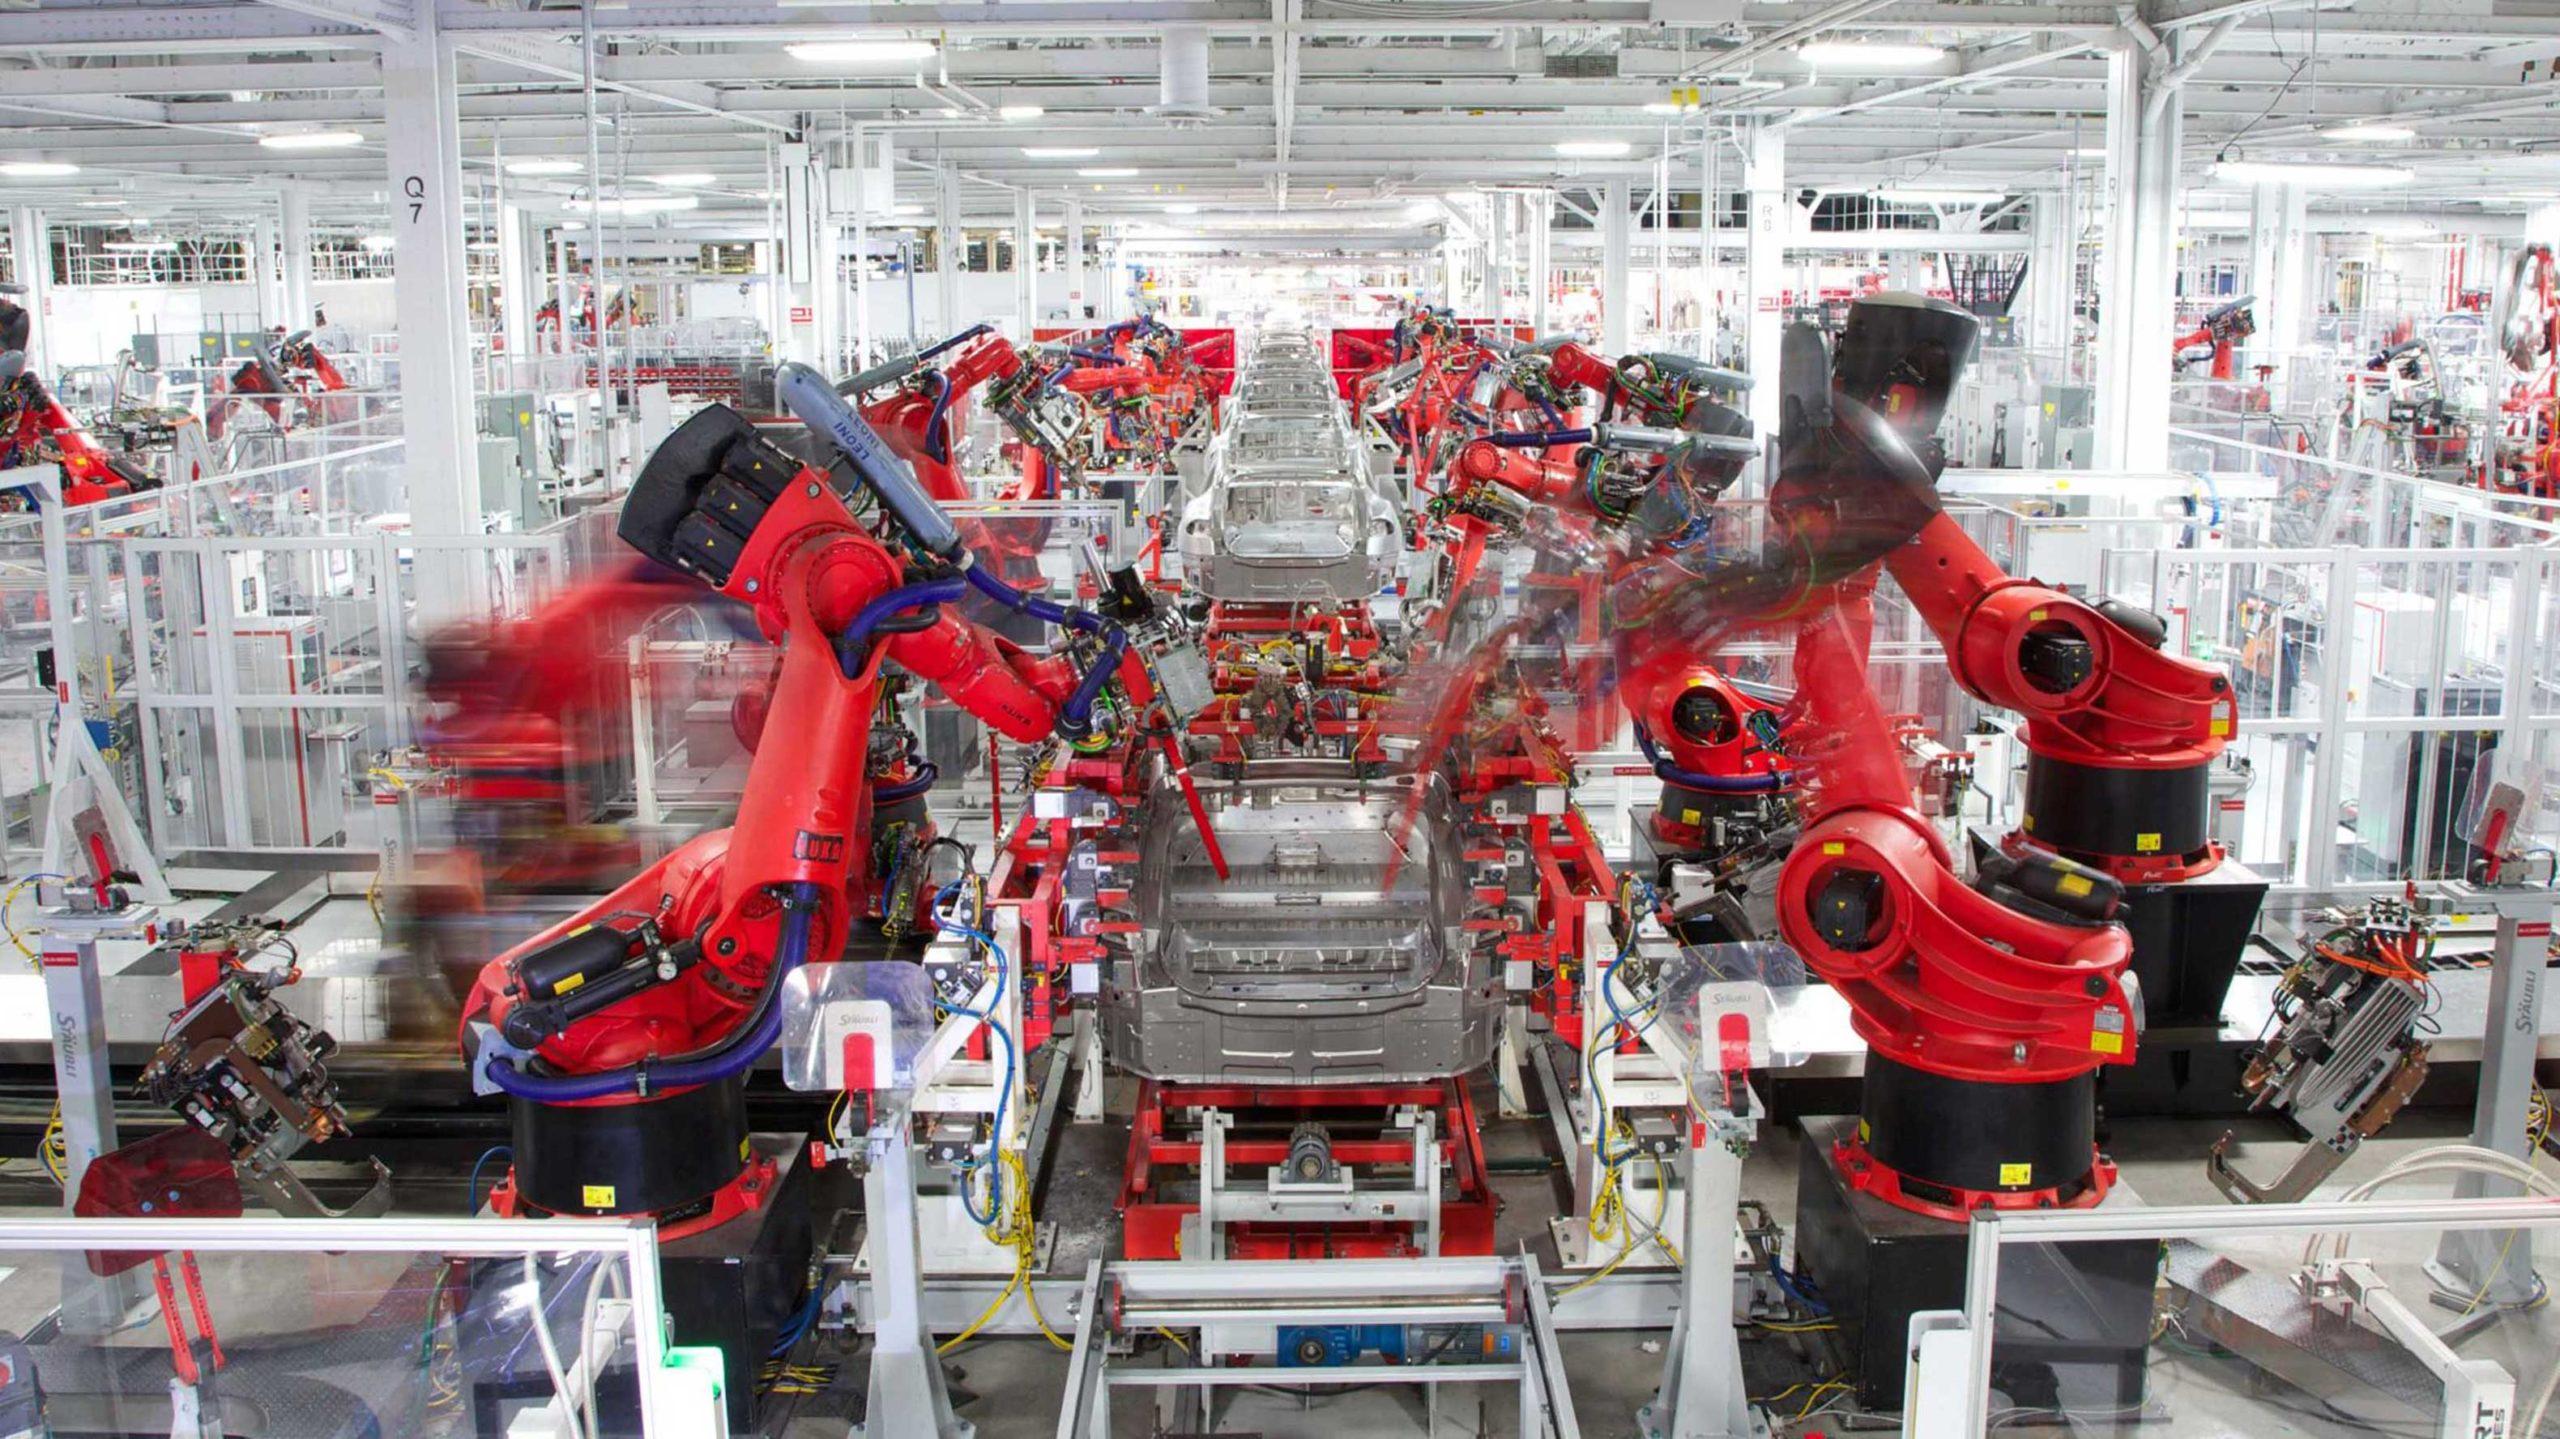 Tesla factory remains open amid coronavirus closures